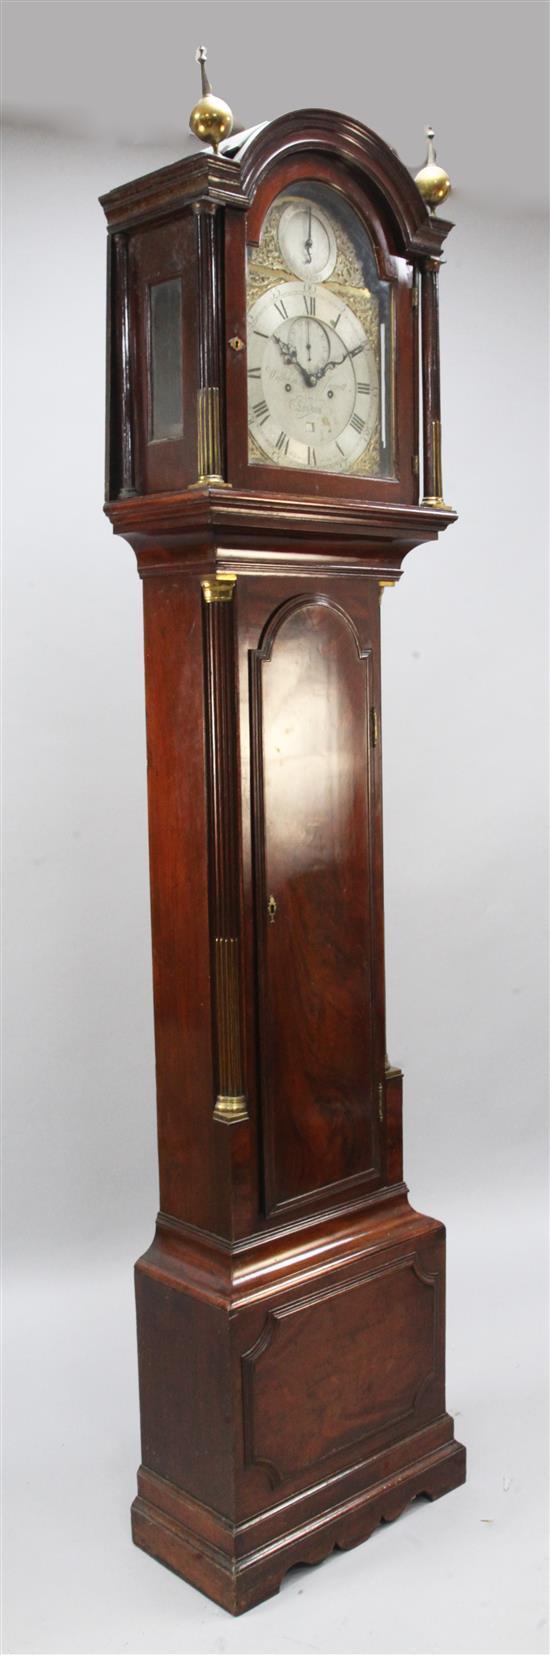 William Jarrett of London. A George III mahogany eight day longcase clock, H.7ft 5in.